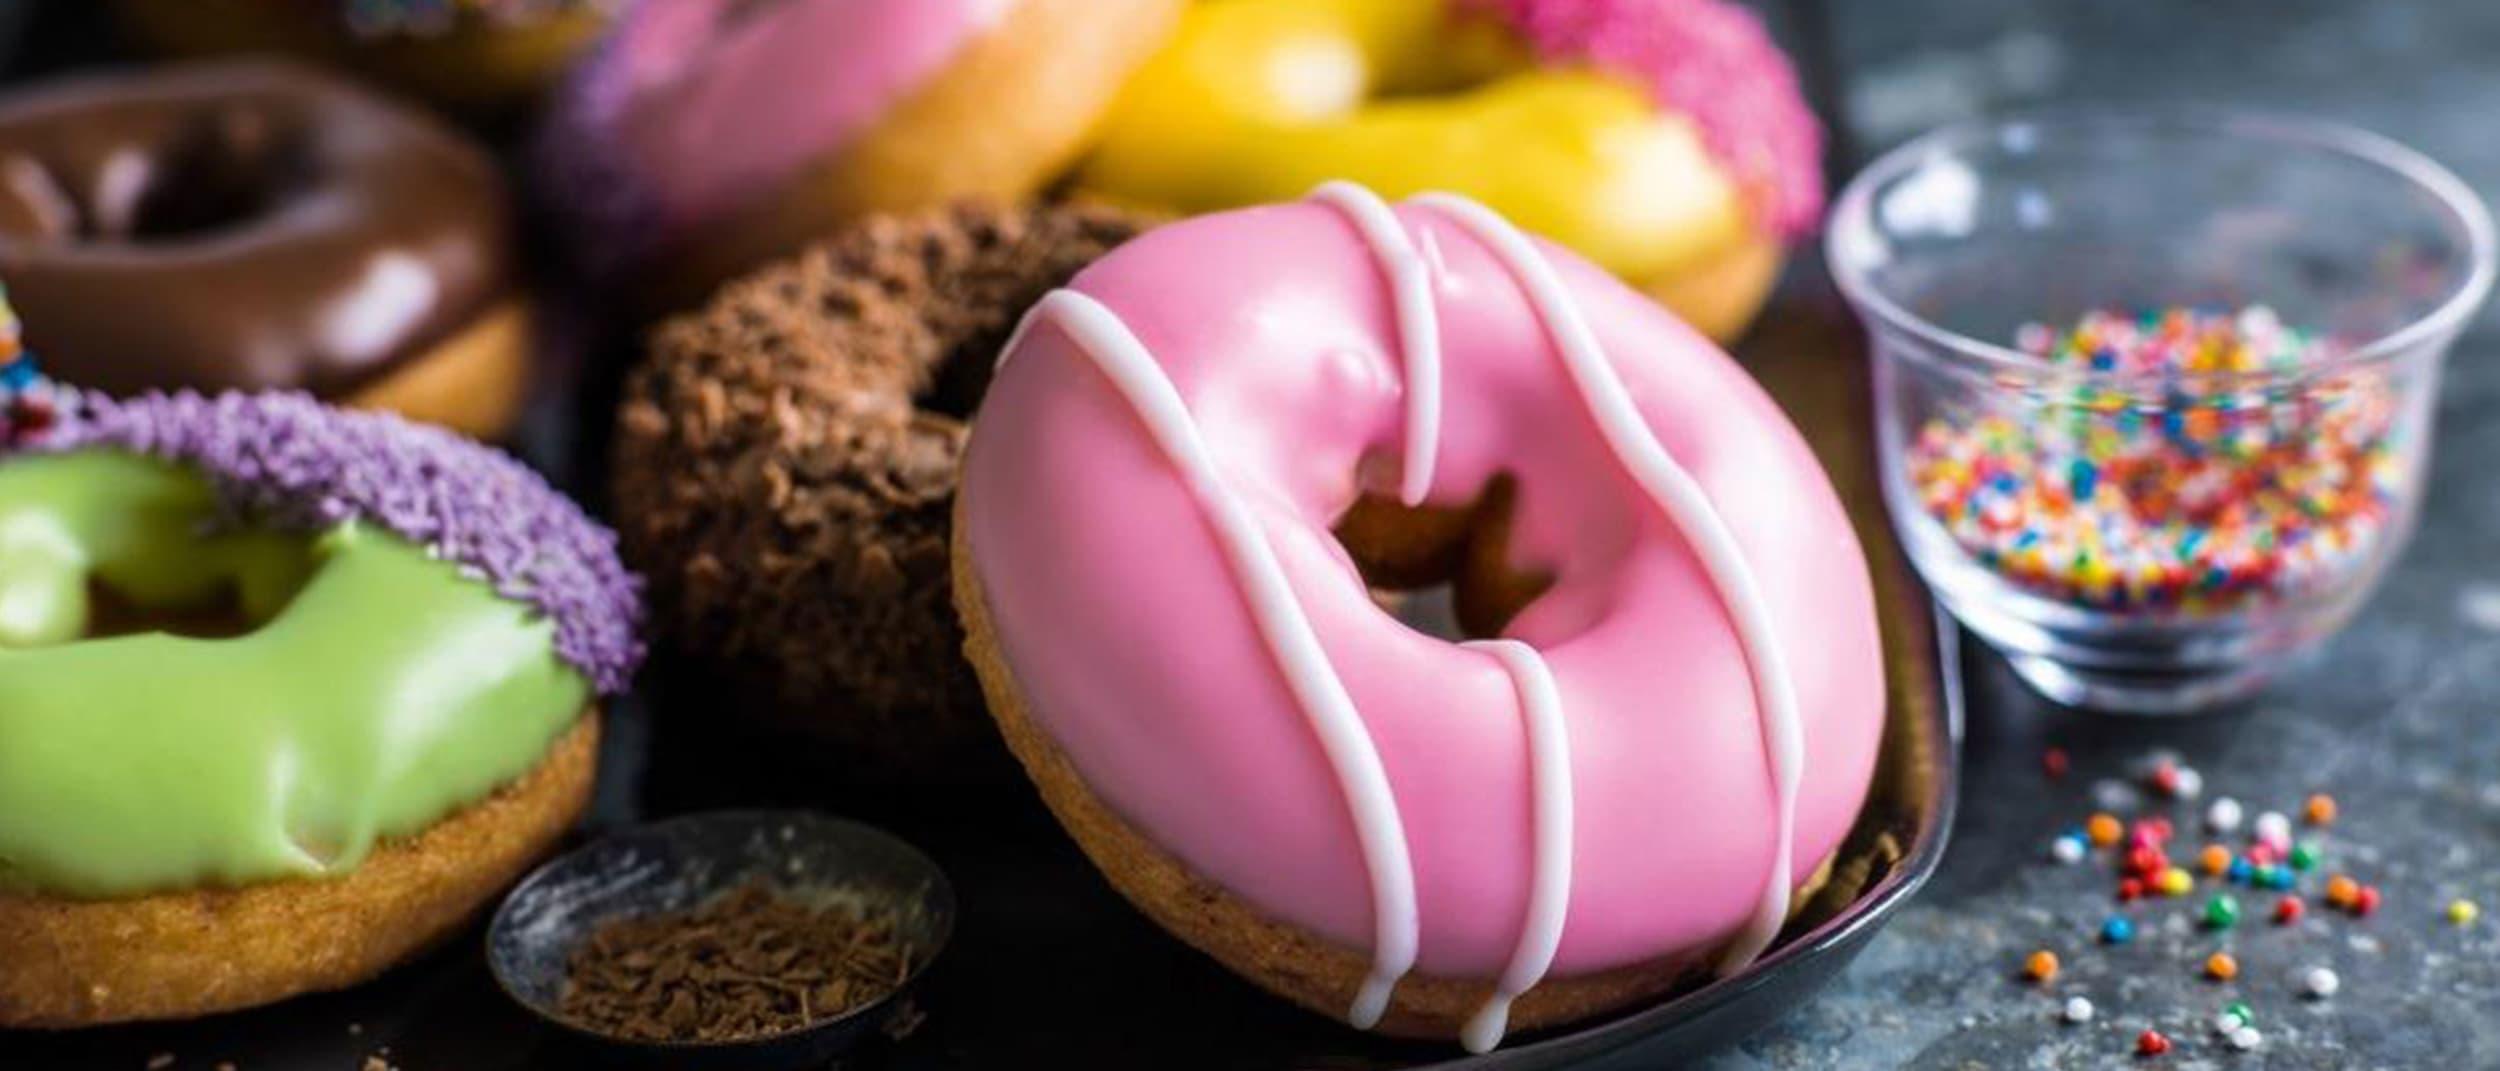 Donut King: Regular coffee & 2 cinnamon donuts $5.40